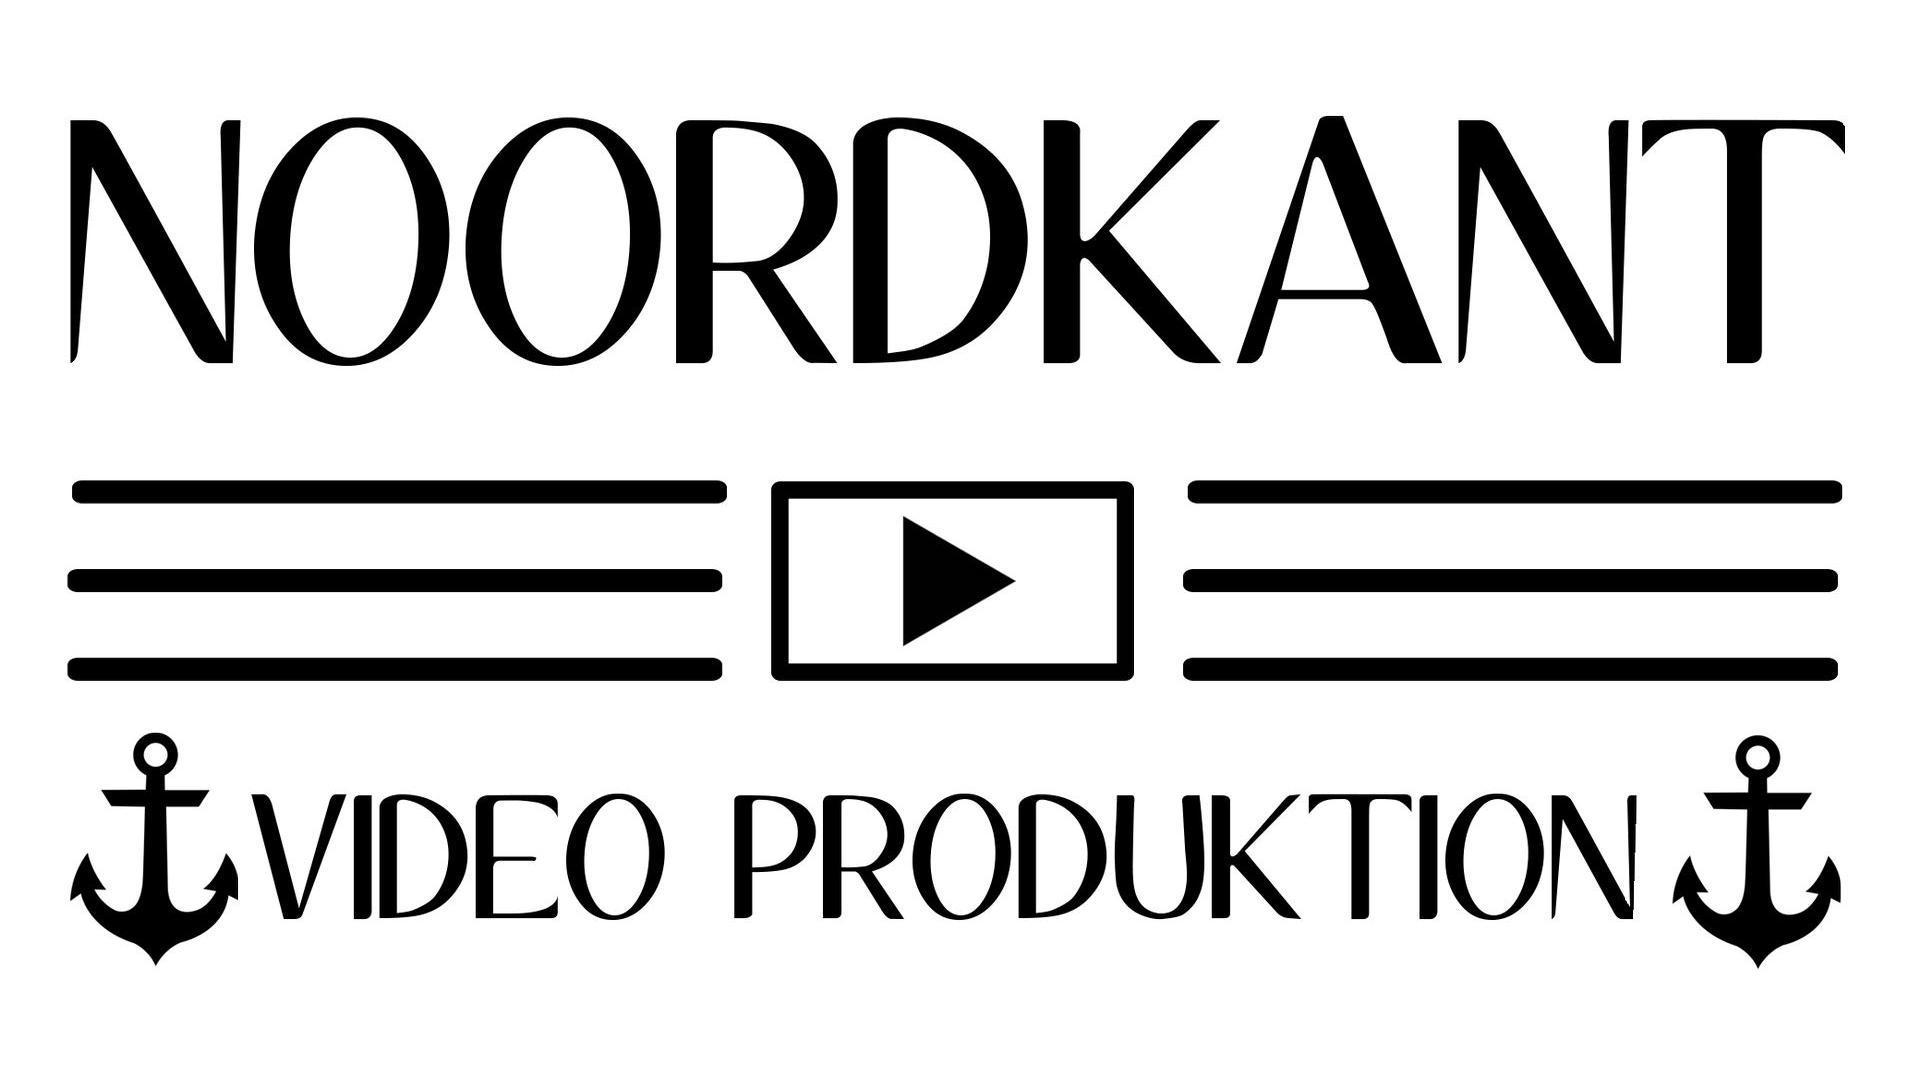 Noordkant Videoproduktion